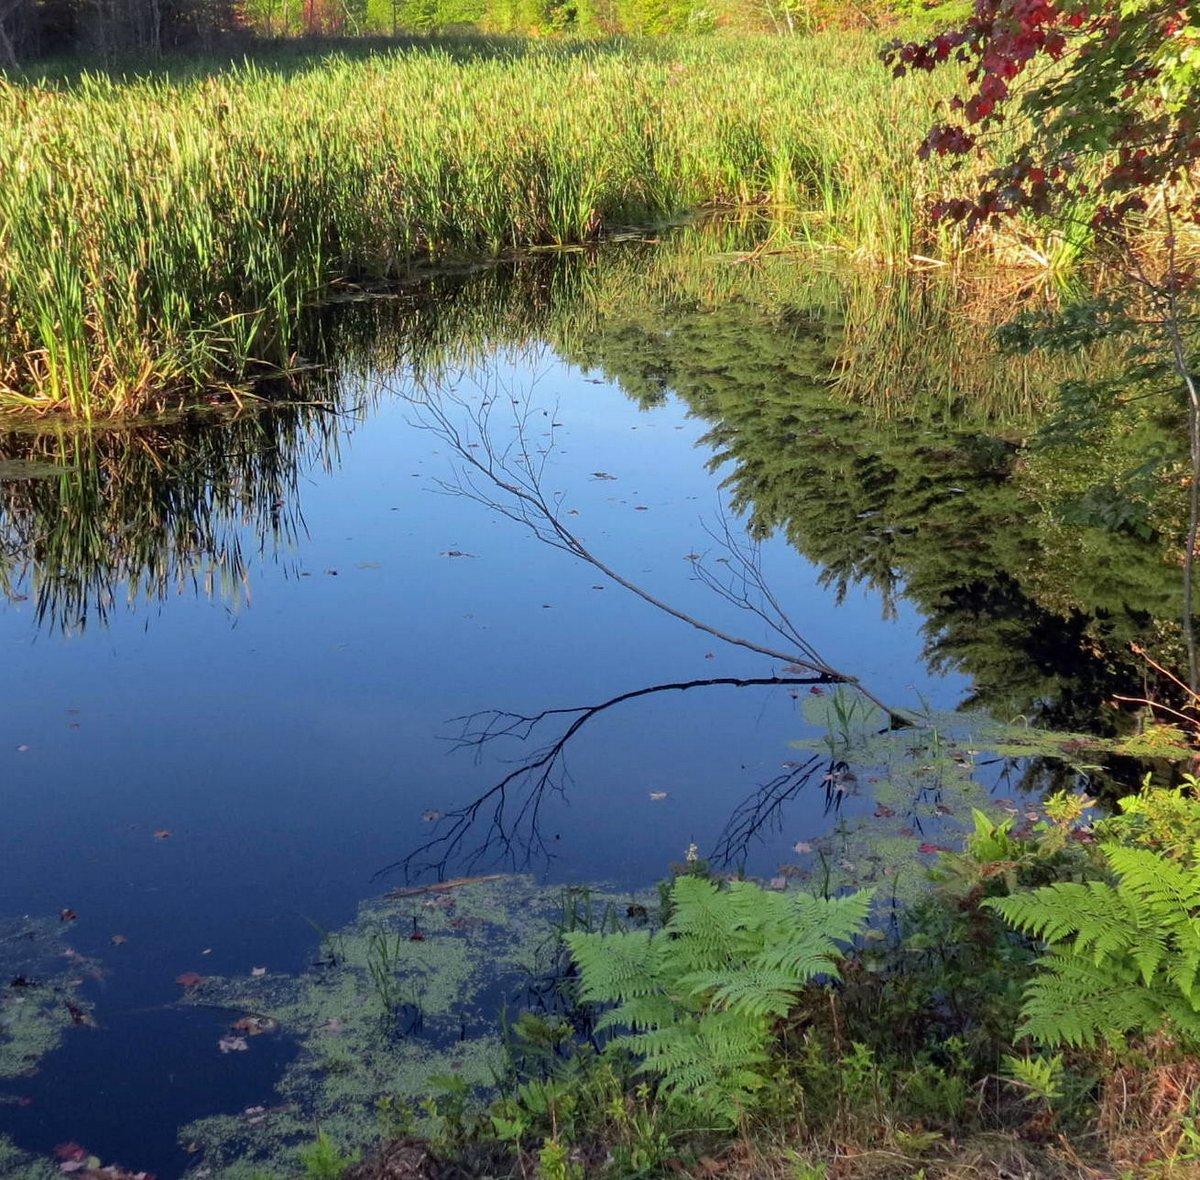 11. Pond